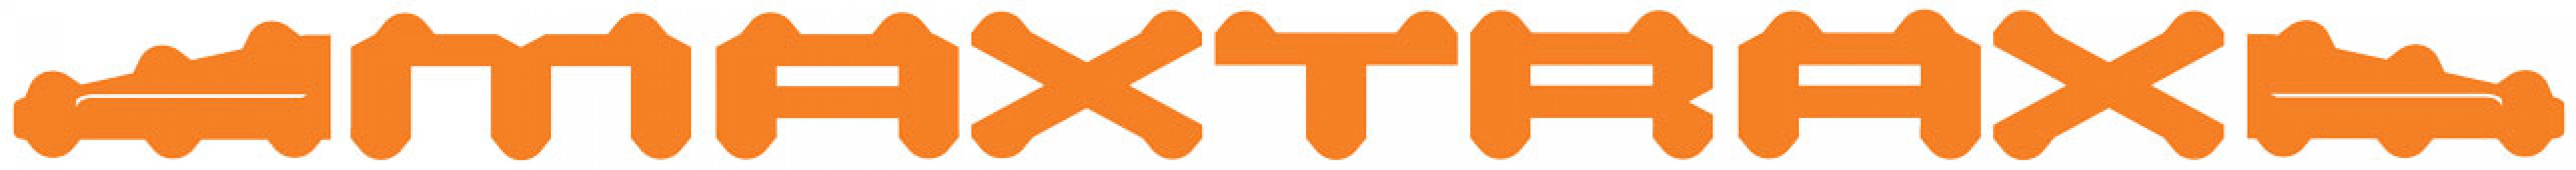 http://www.beadlok.com/Logo/Maxtrax.jpg